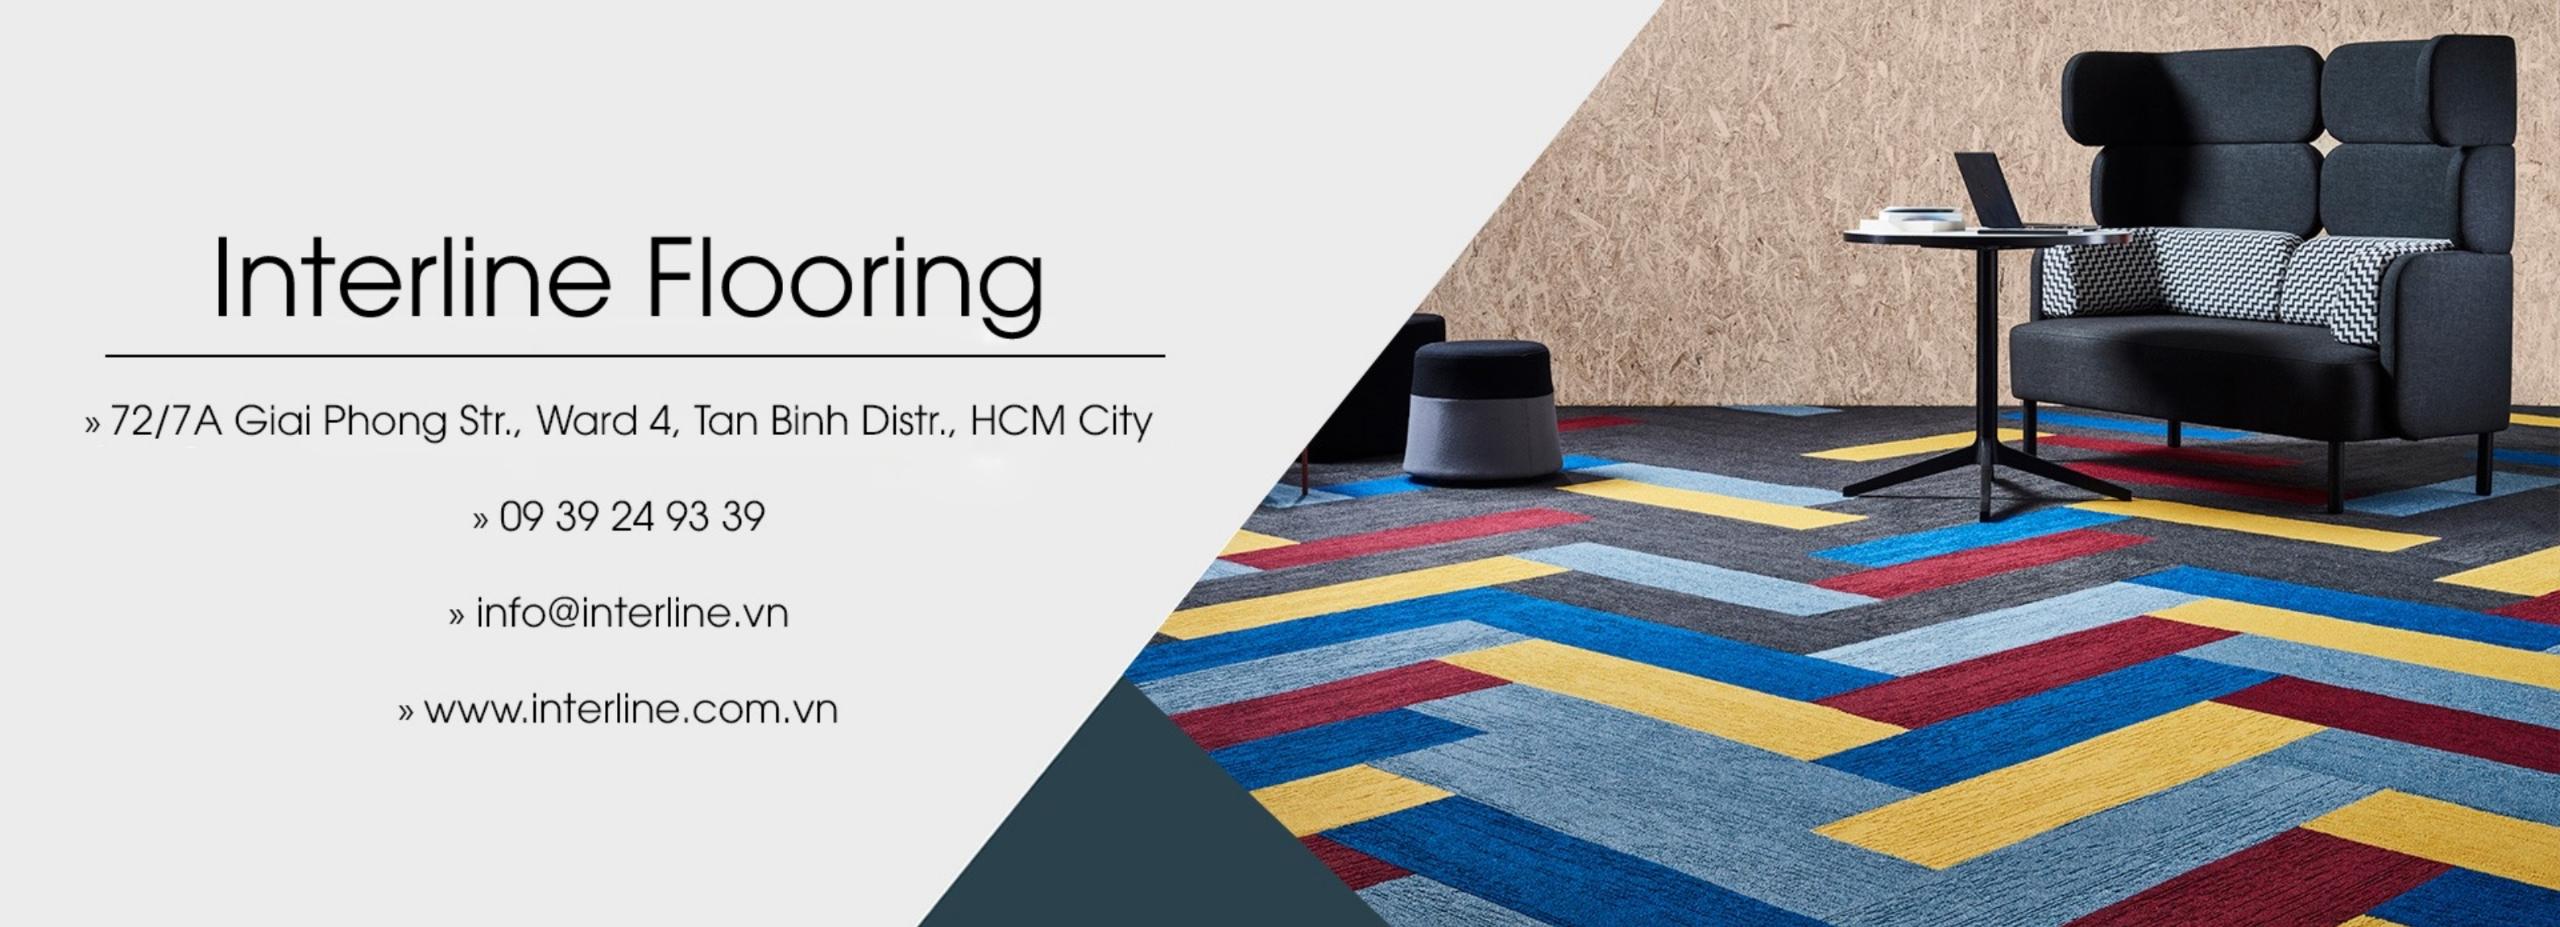 interline flooring (@interlineflooring) Cover Image